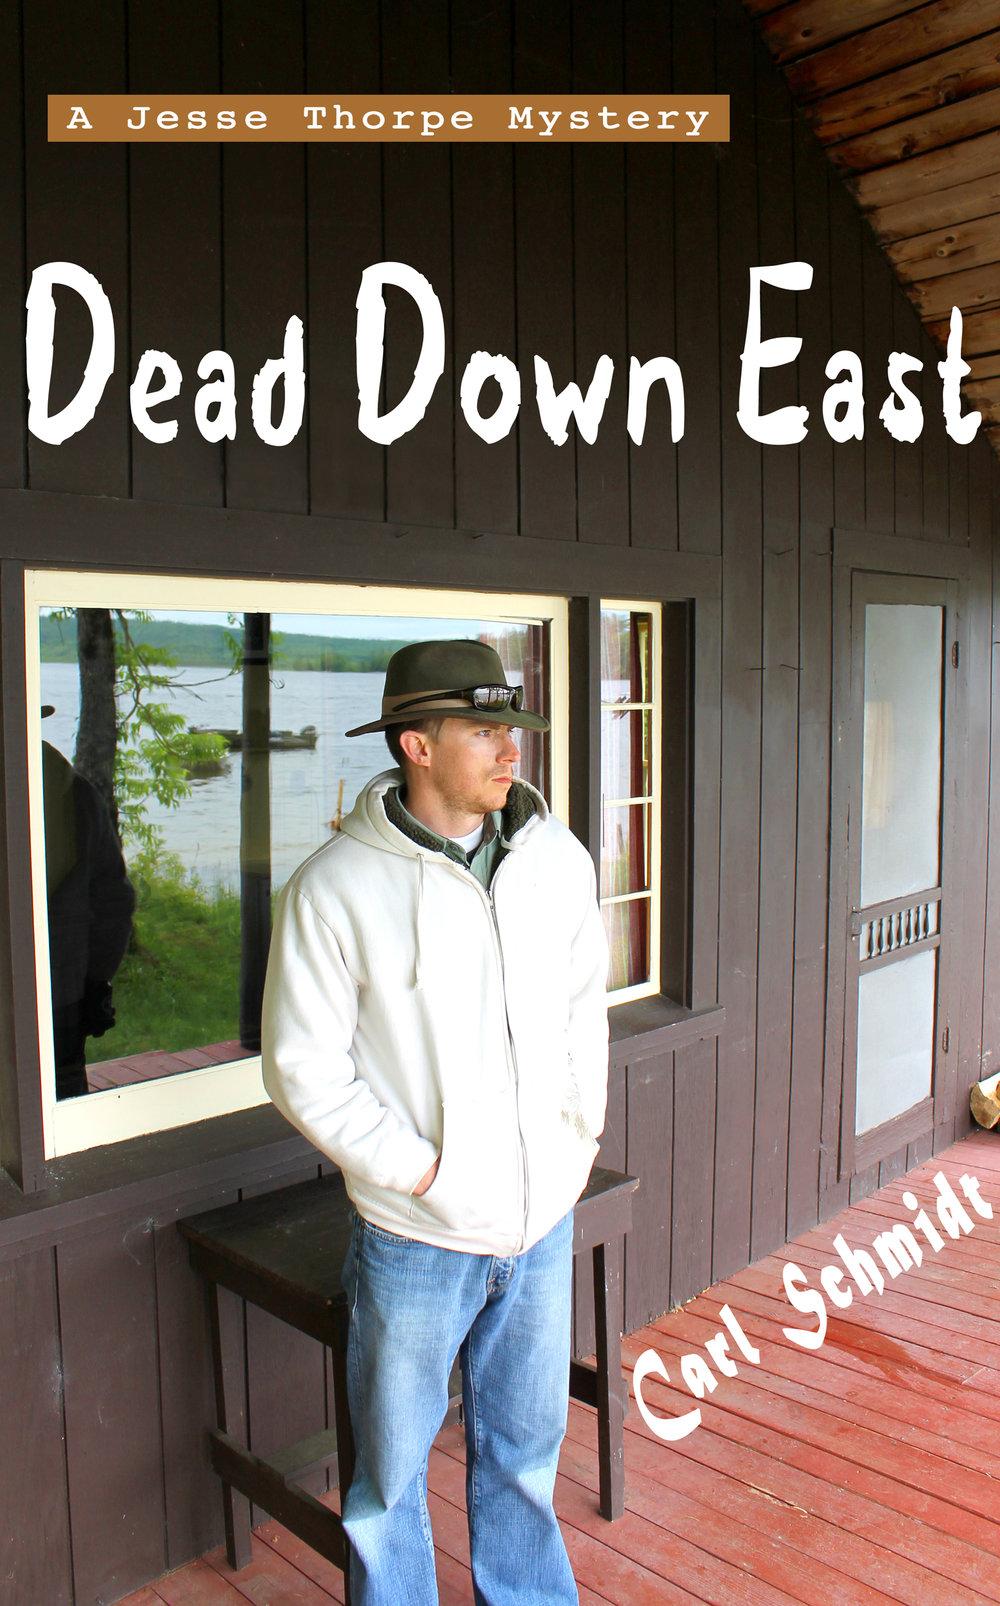 Dead Down East